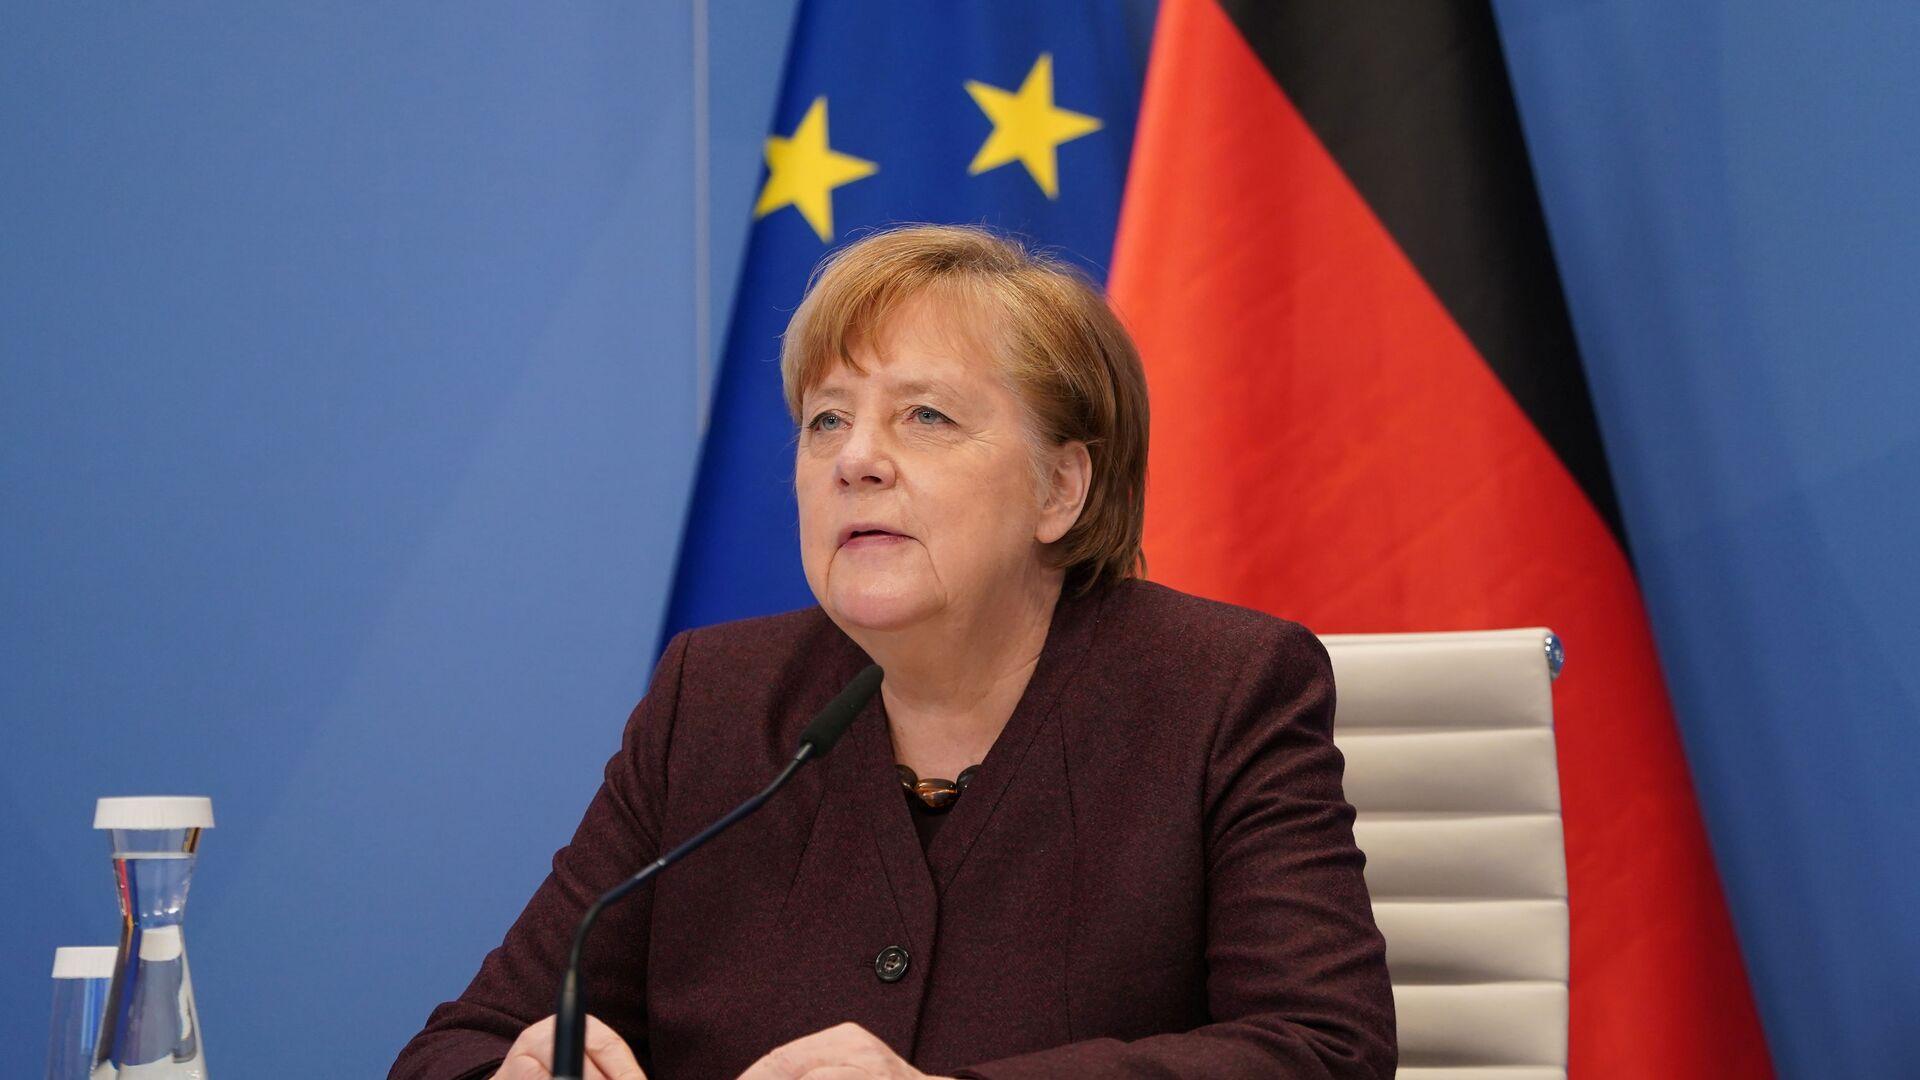 Angela Merkel, canciller alemana - Sputnik Mundo, 1920, 28.06.2021